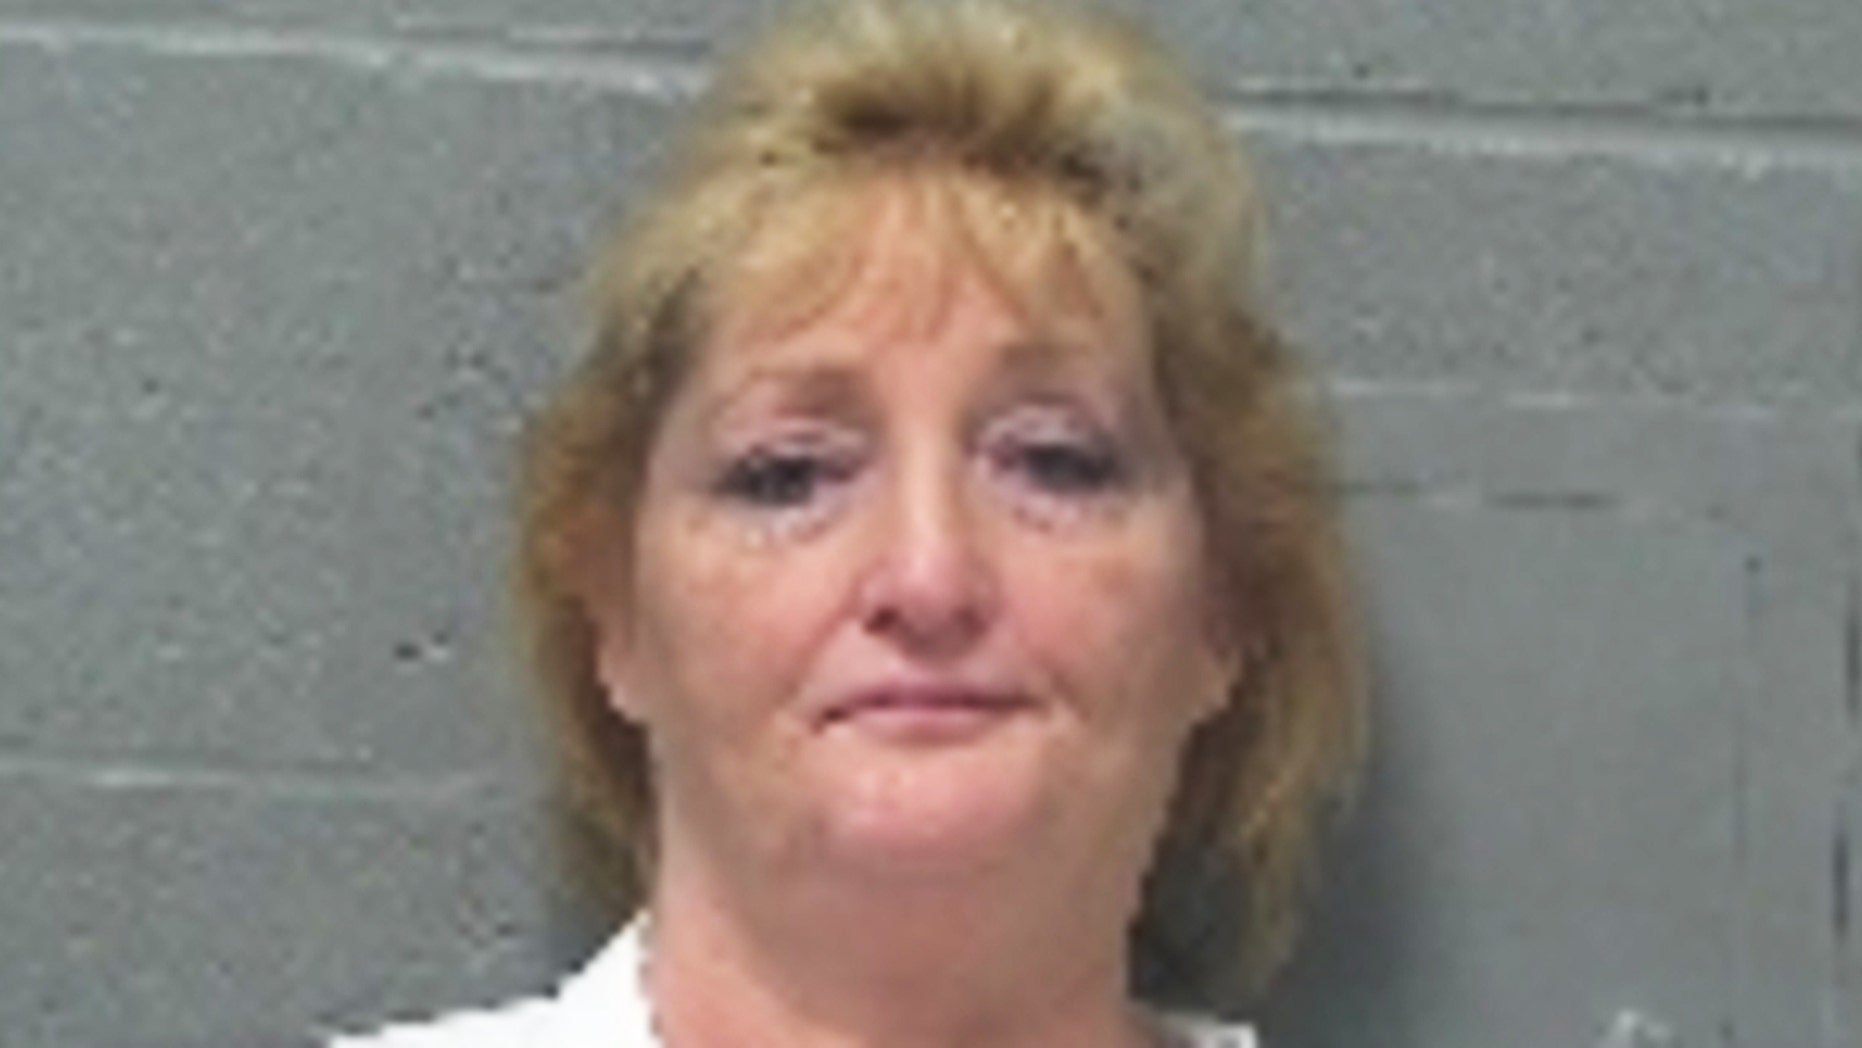 LaDonna Hughett was arrested on Saturday.